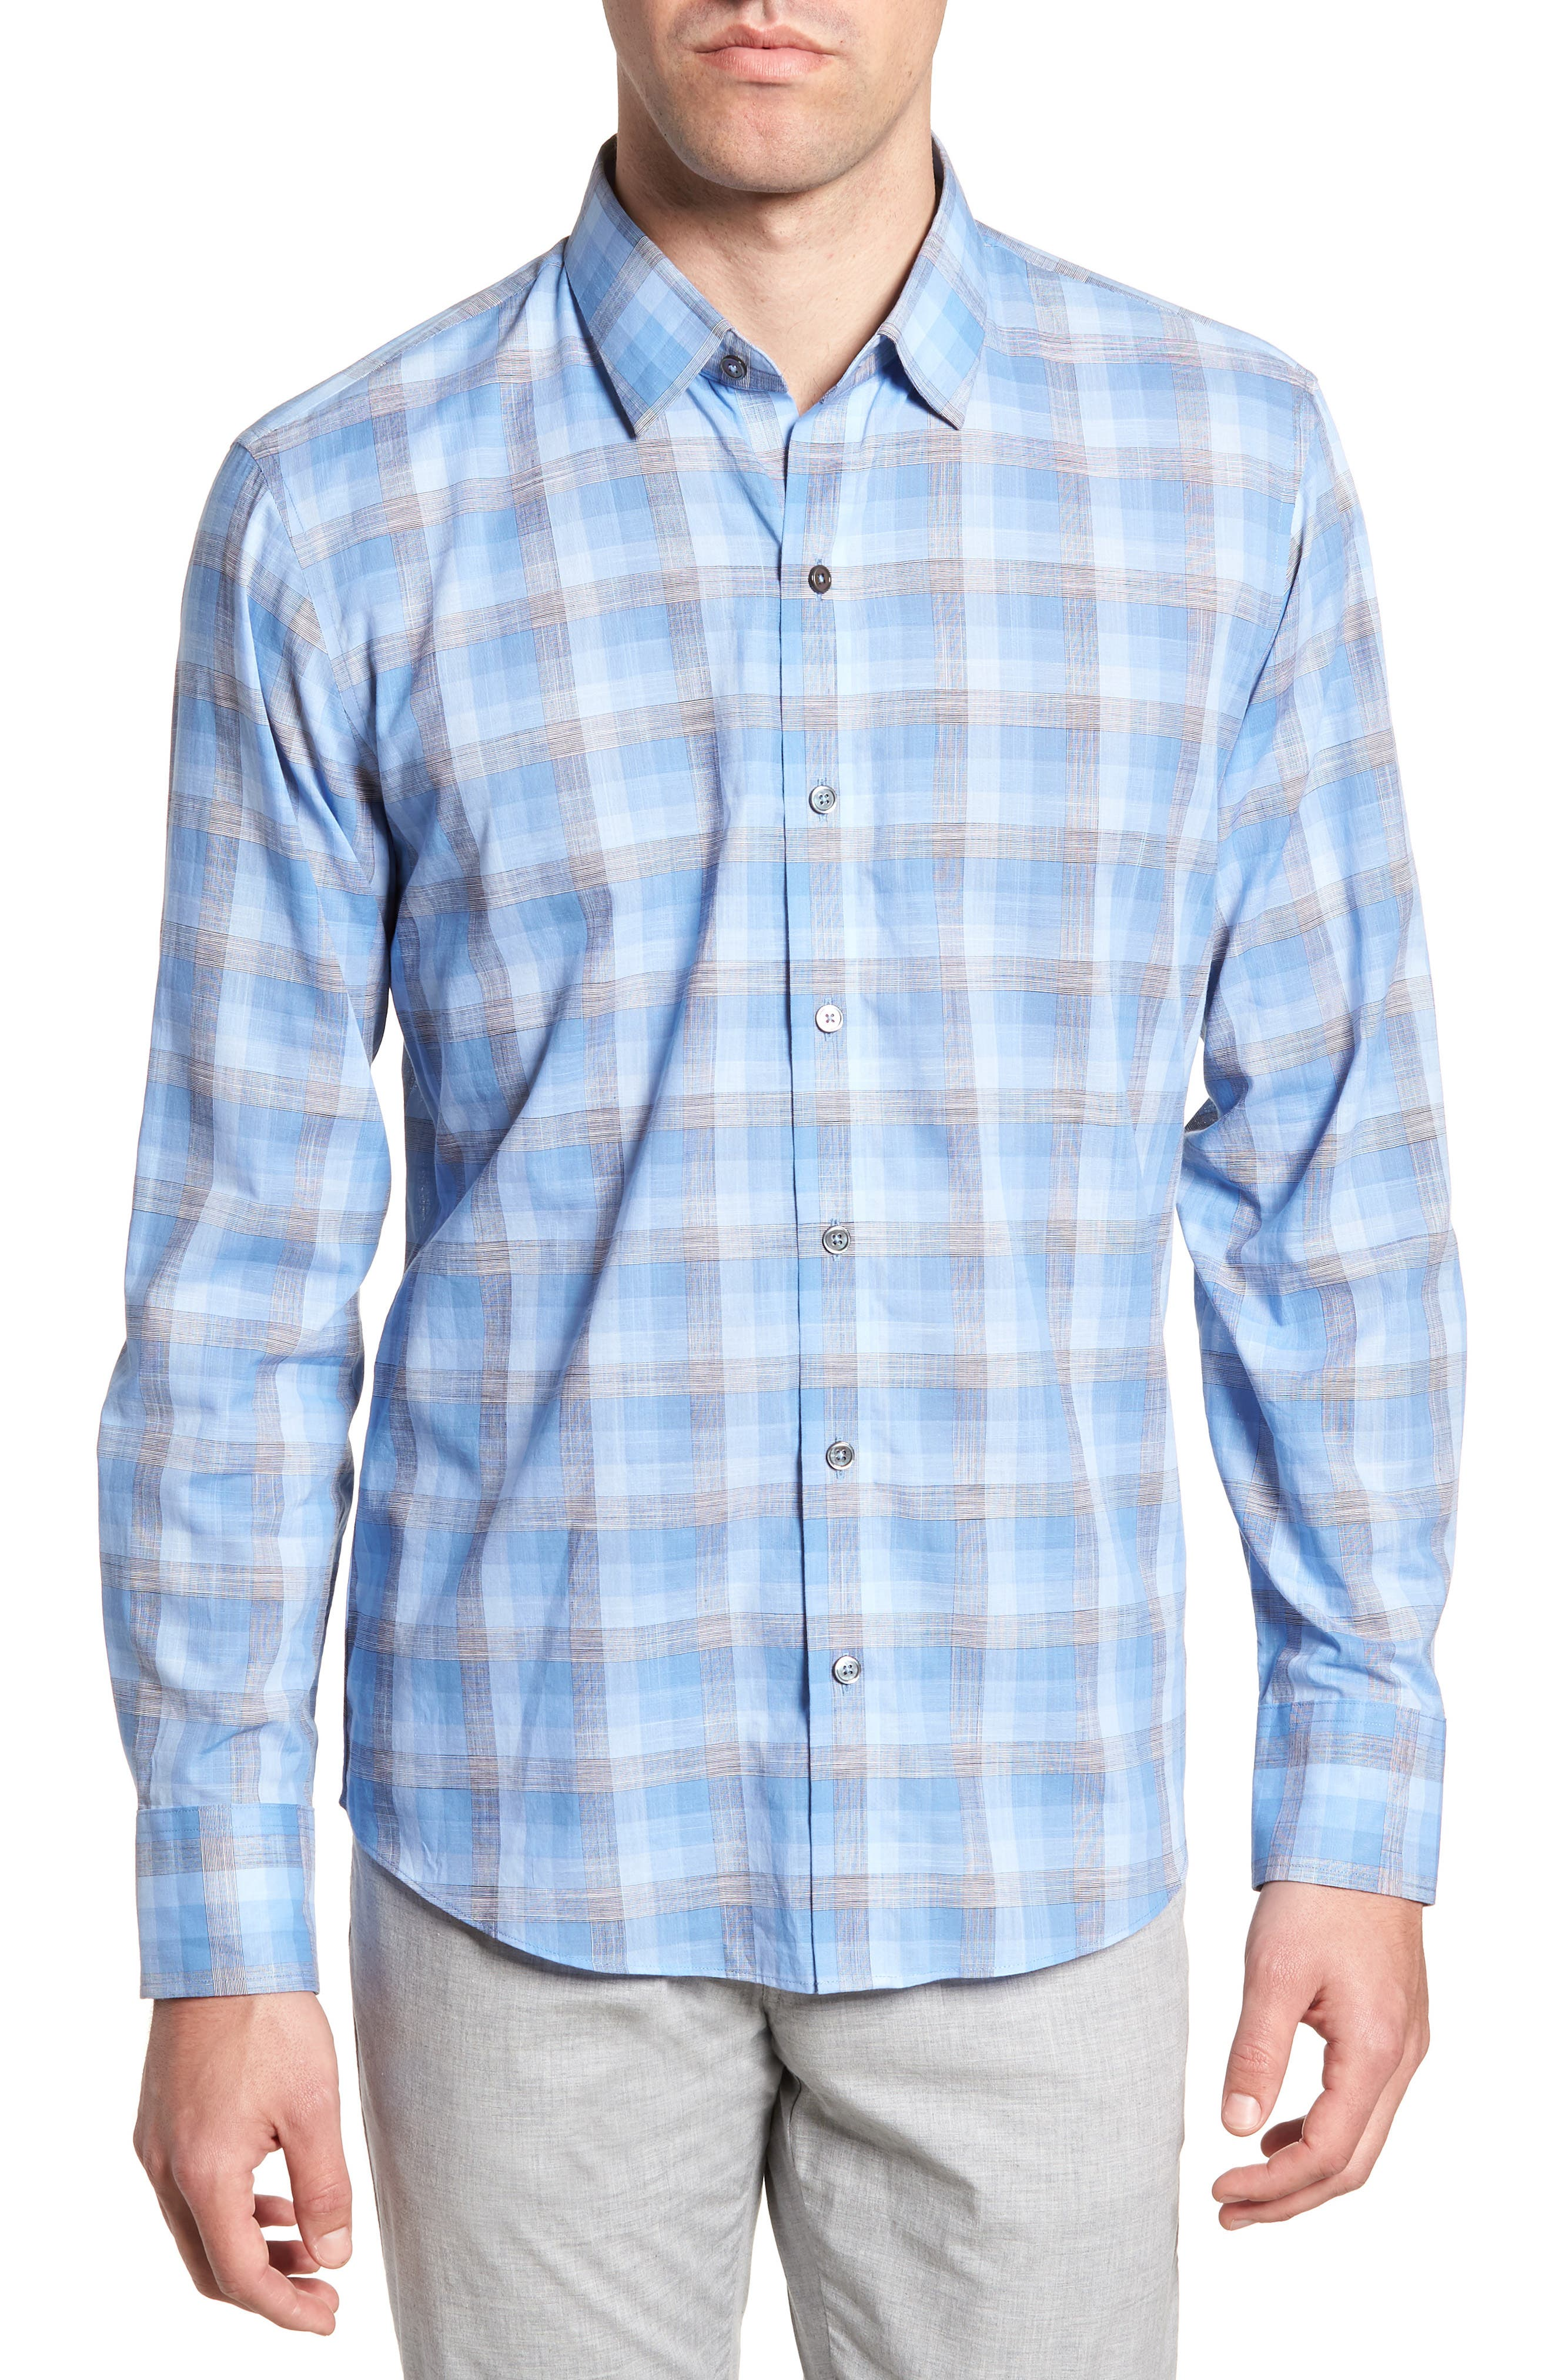 Asim Regular Fit Sport Shirt,                             Main thumbnail 1, color,                             422